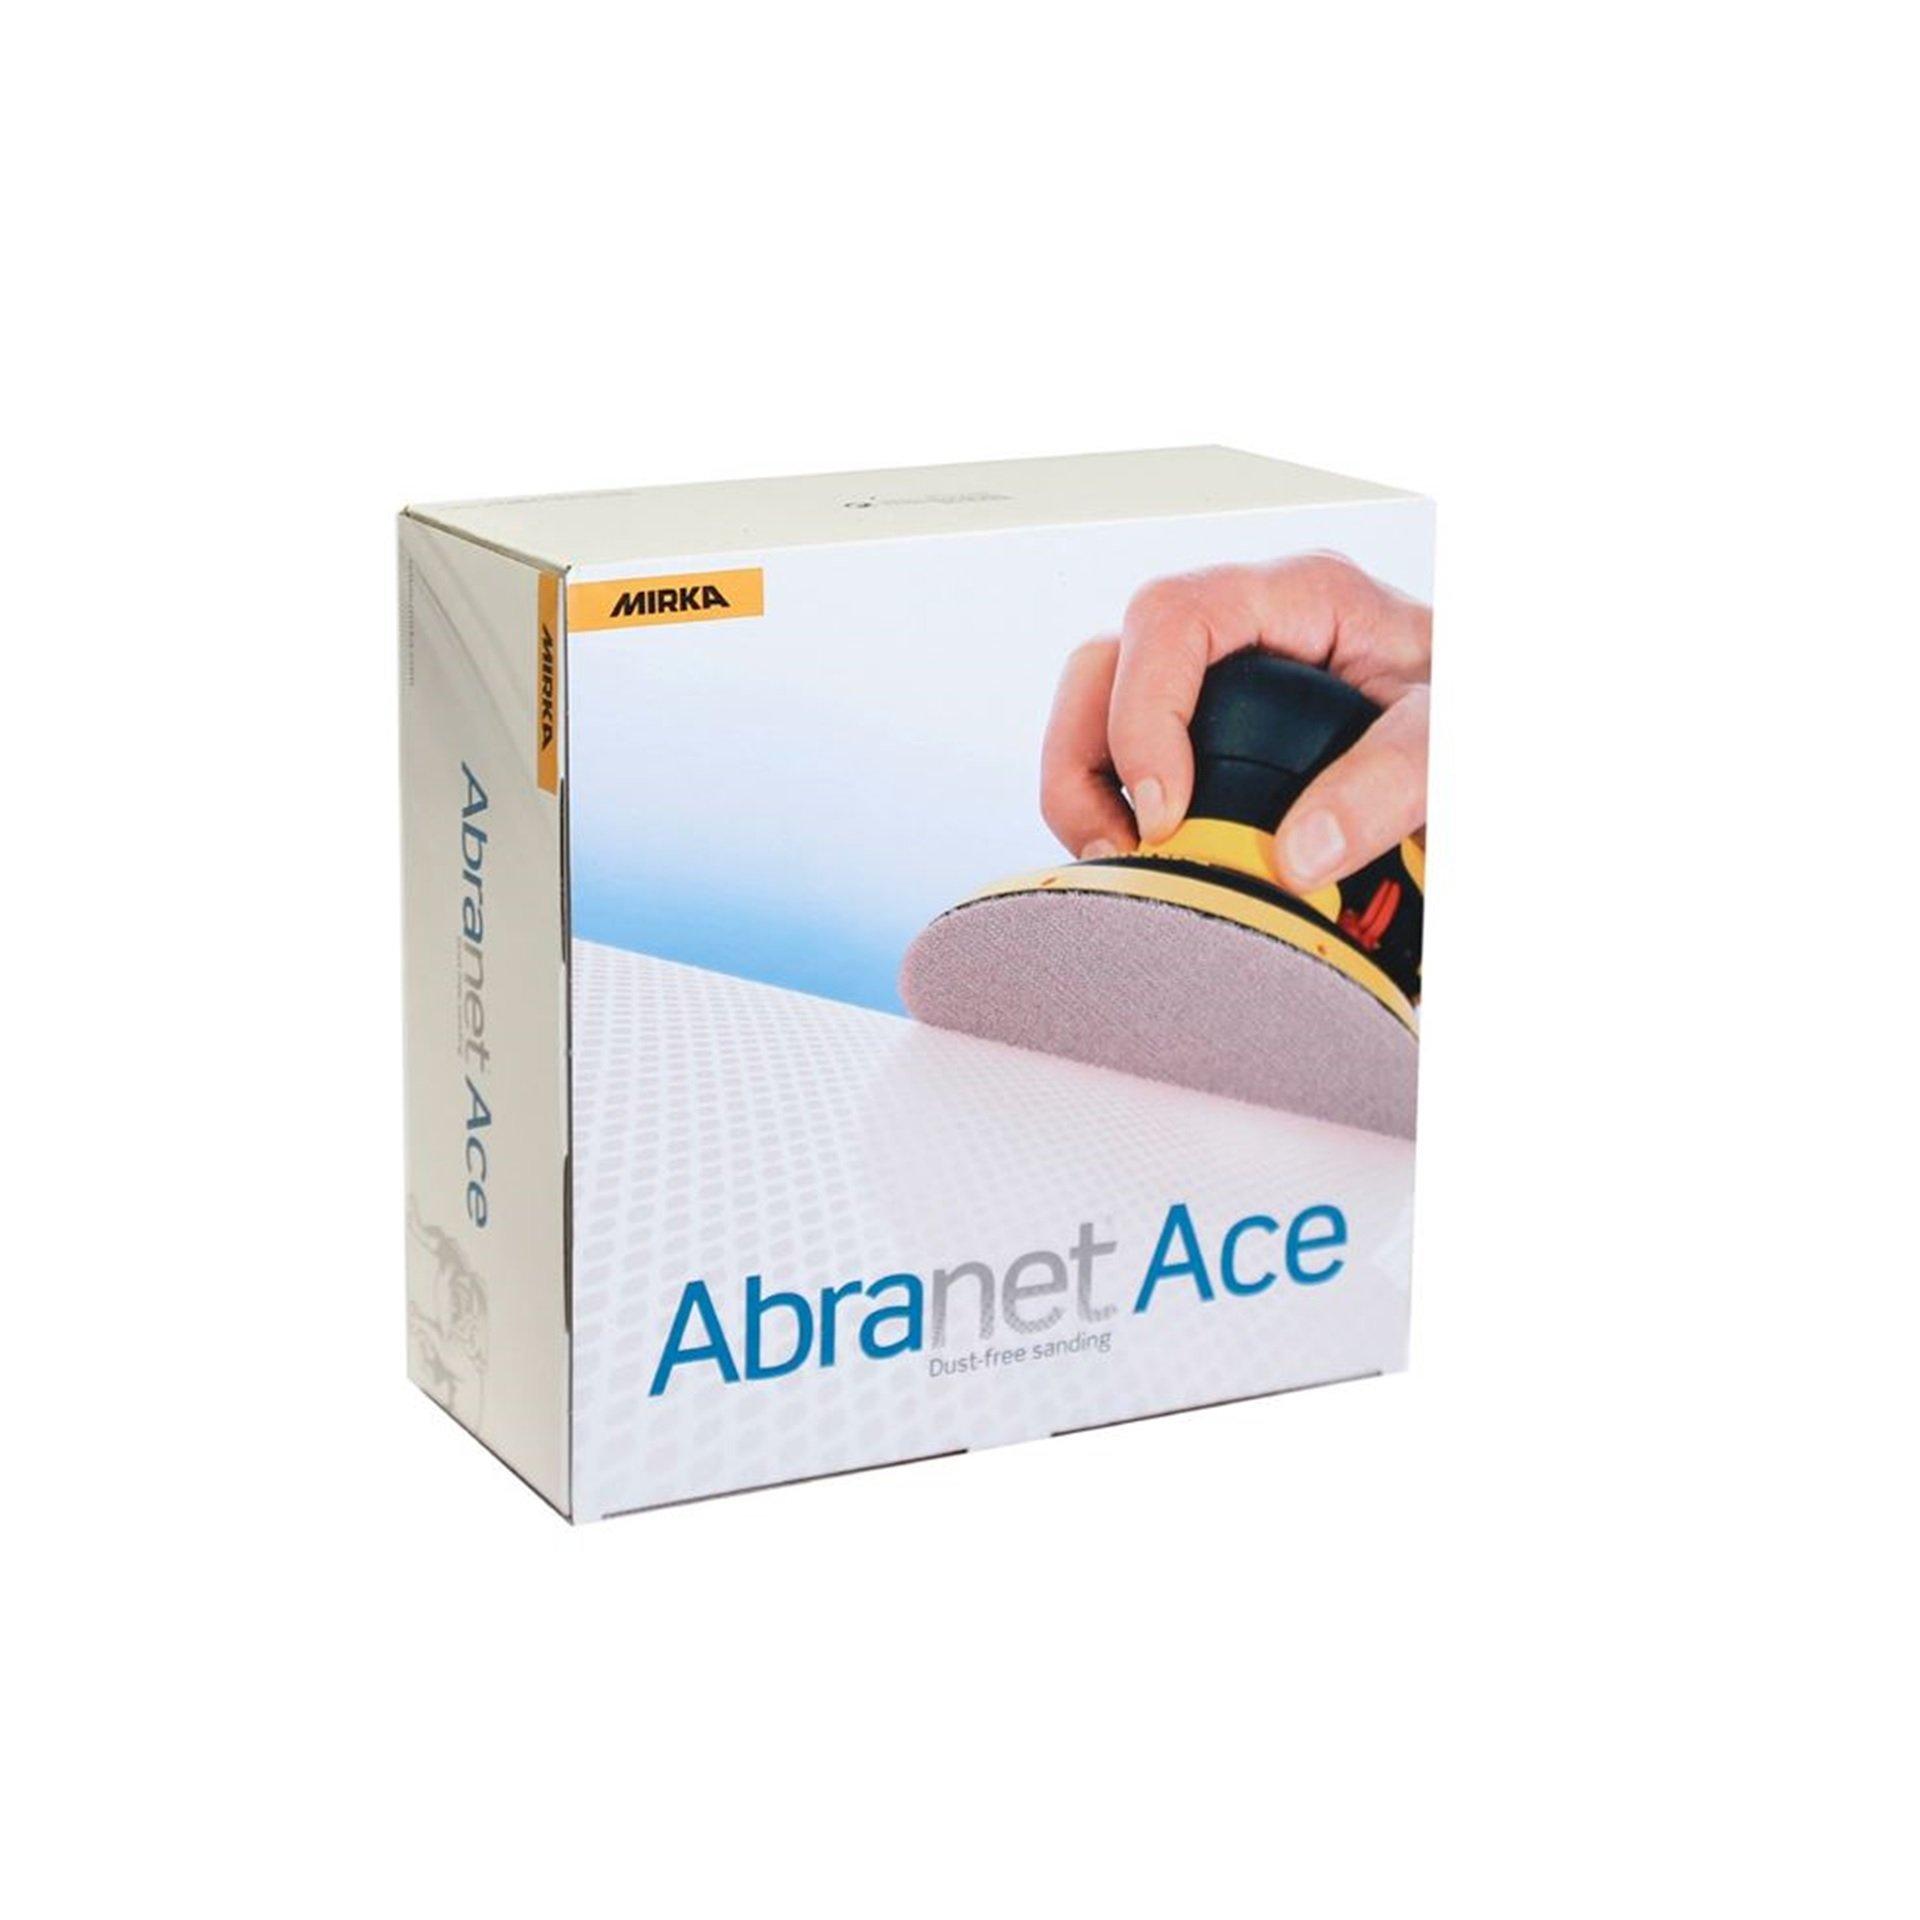 Image of Mirka Abranet Ace Sanding Discs